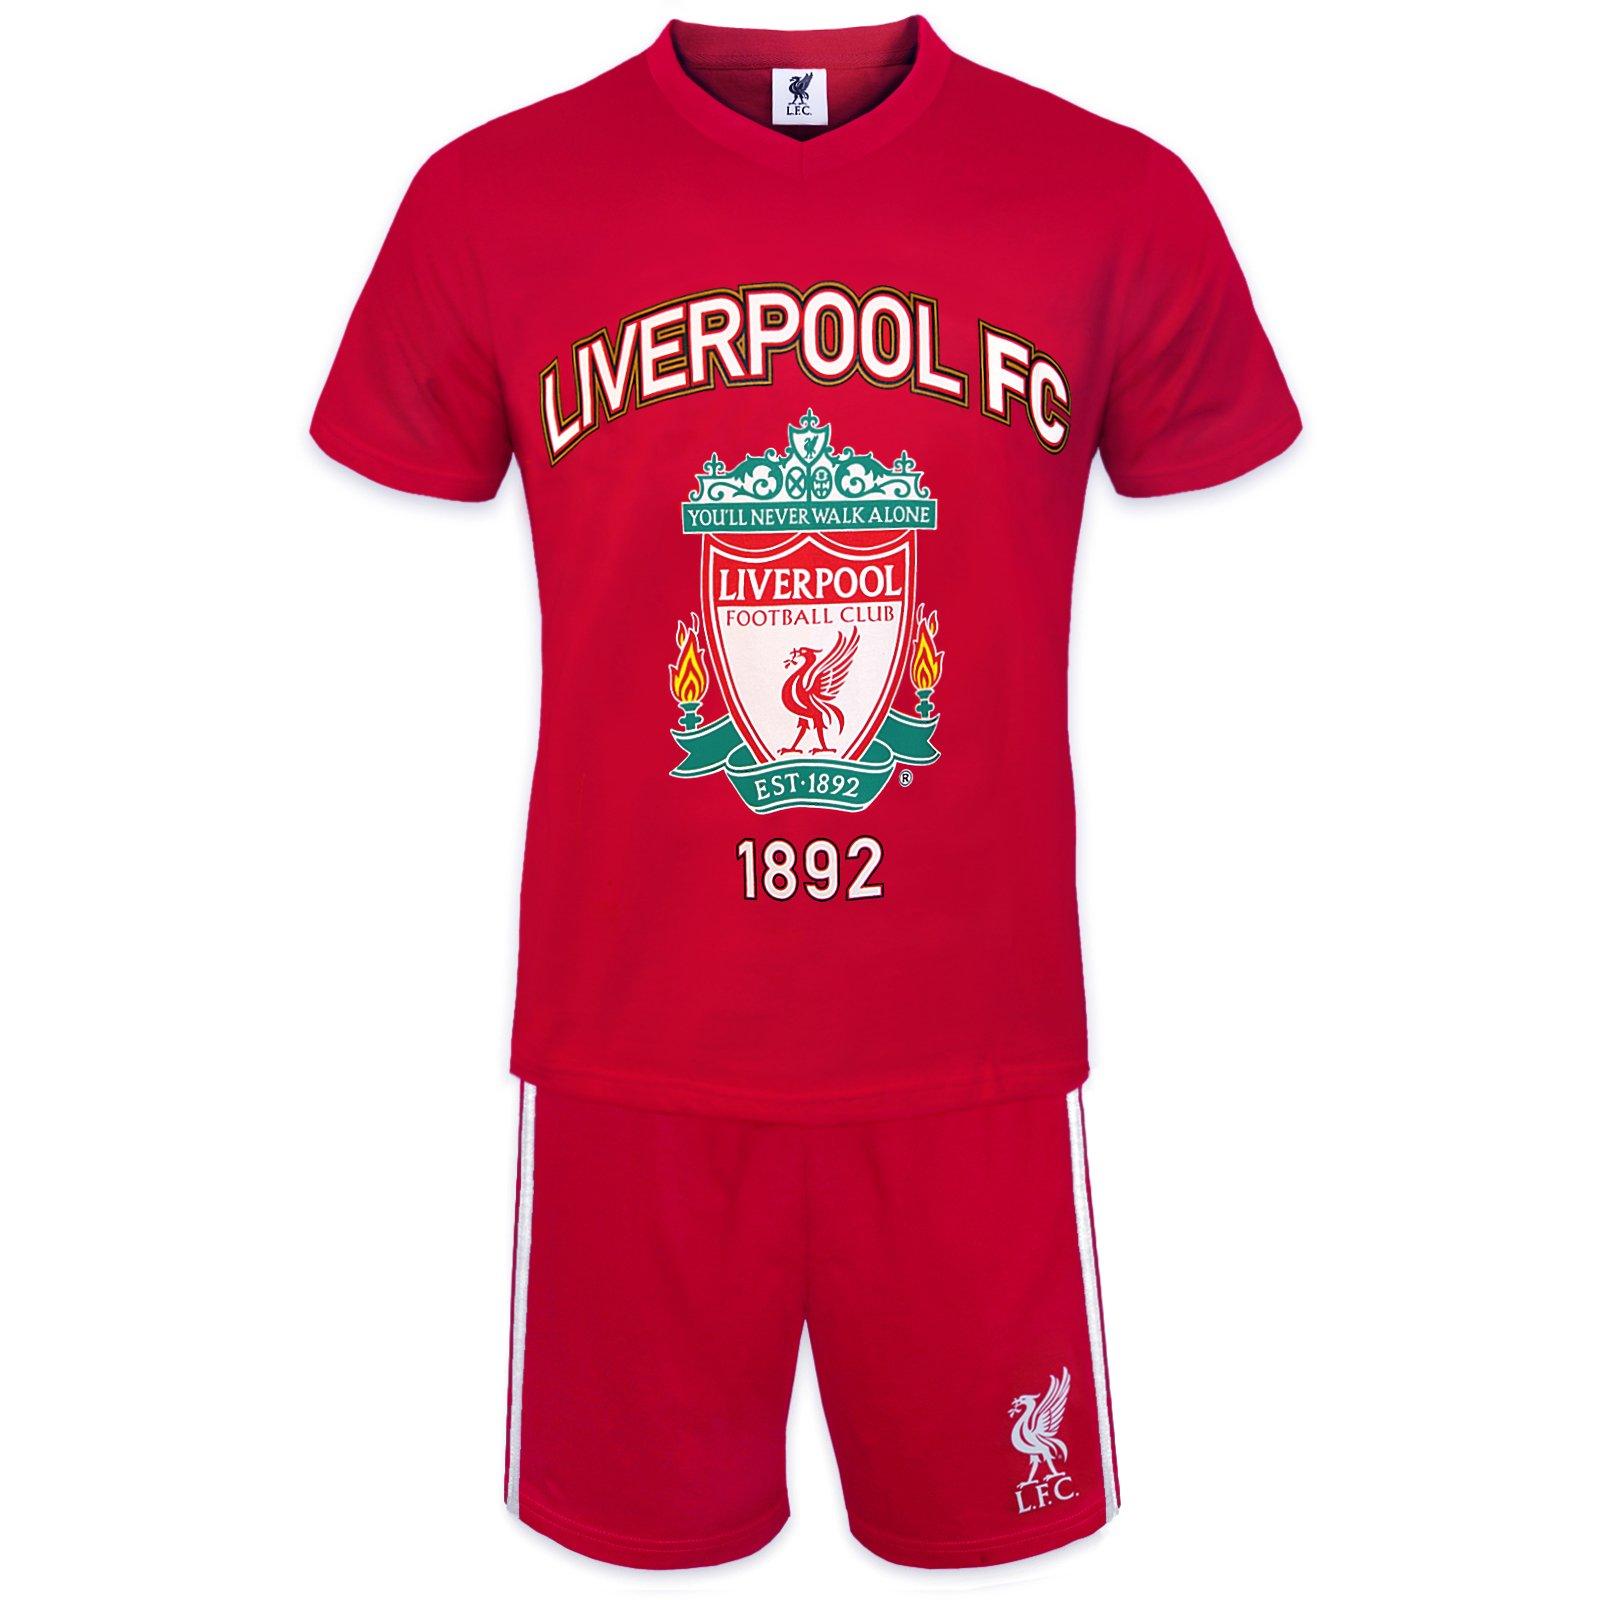 Liverpool FC Official Football Gift Mens Loungewear Short Pyjamas Red XL